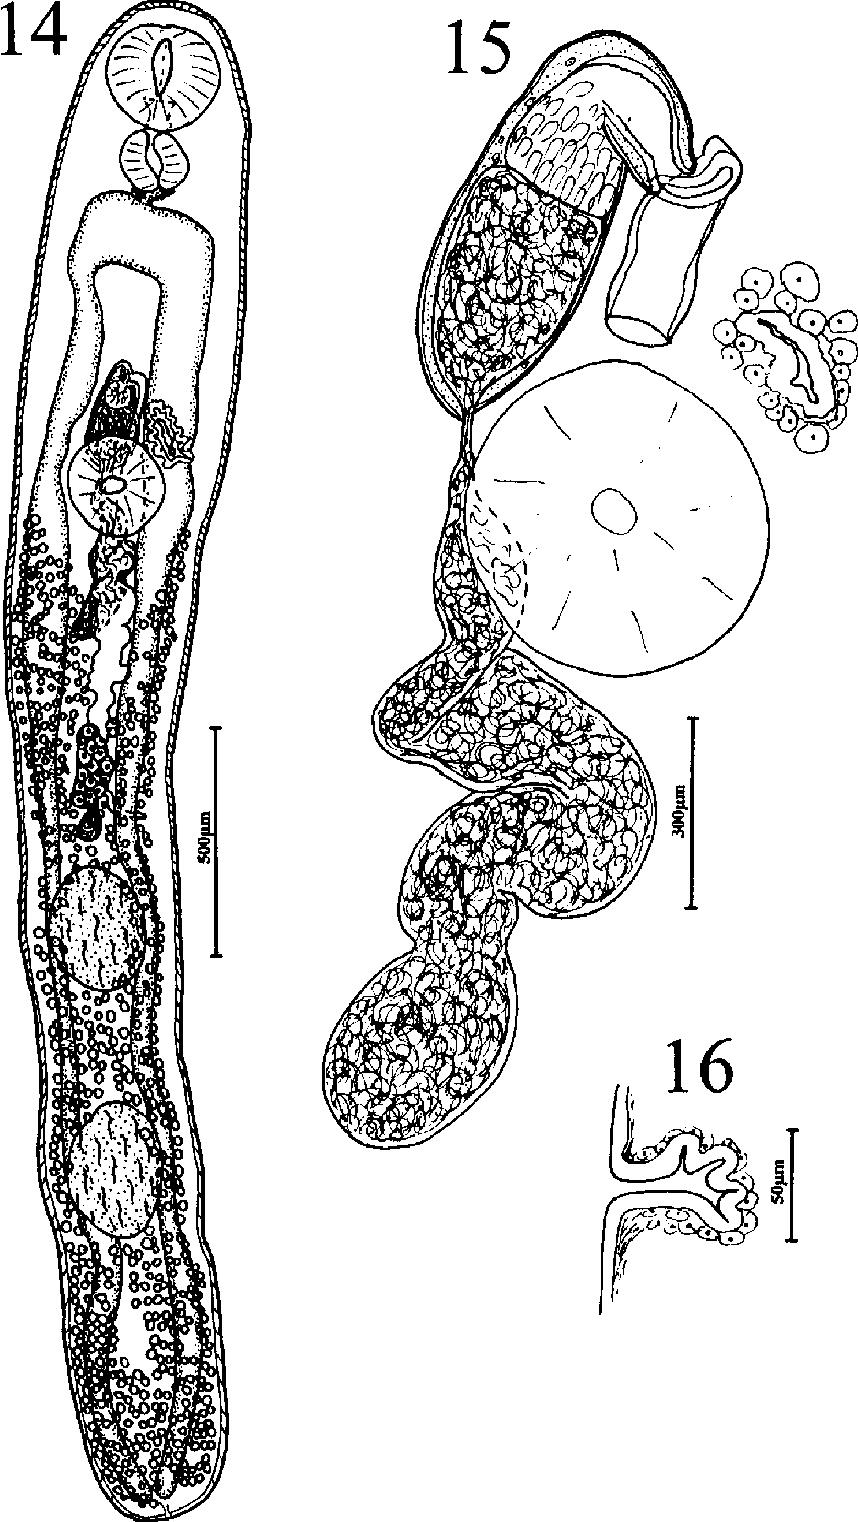 figure 14–16